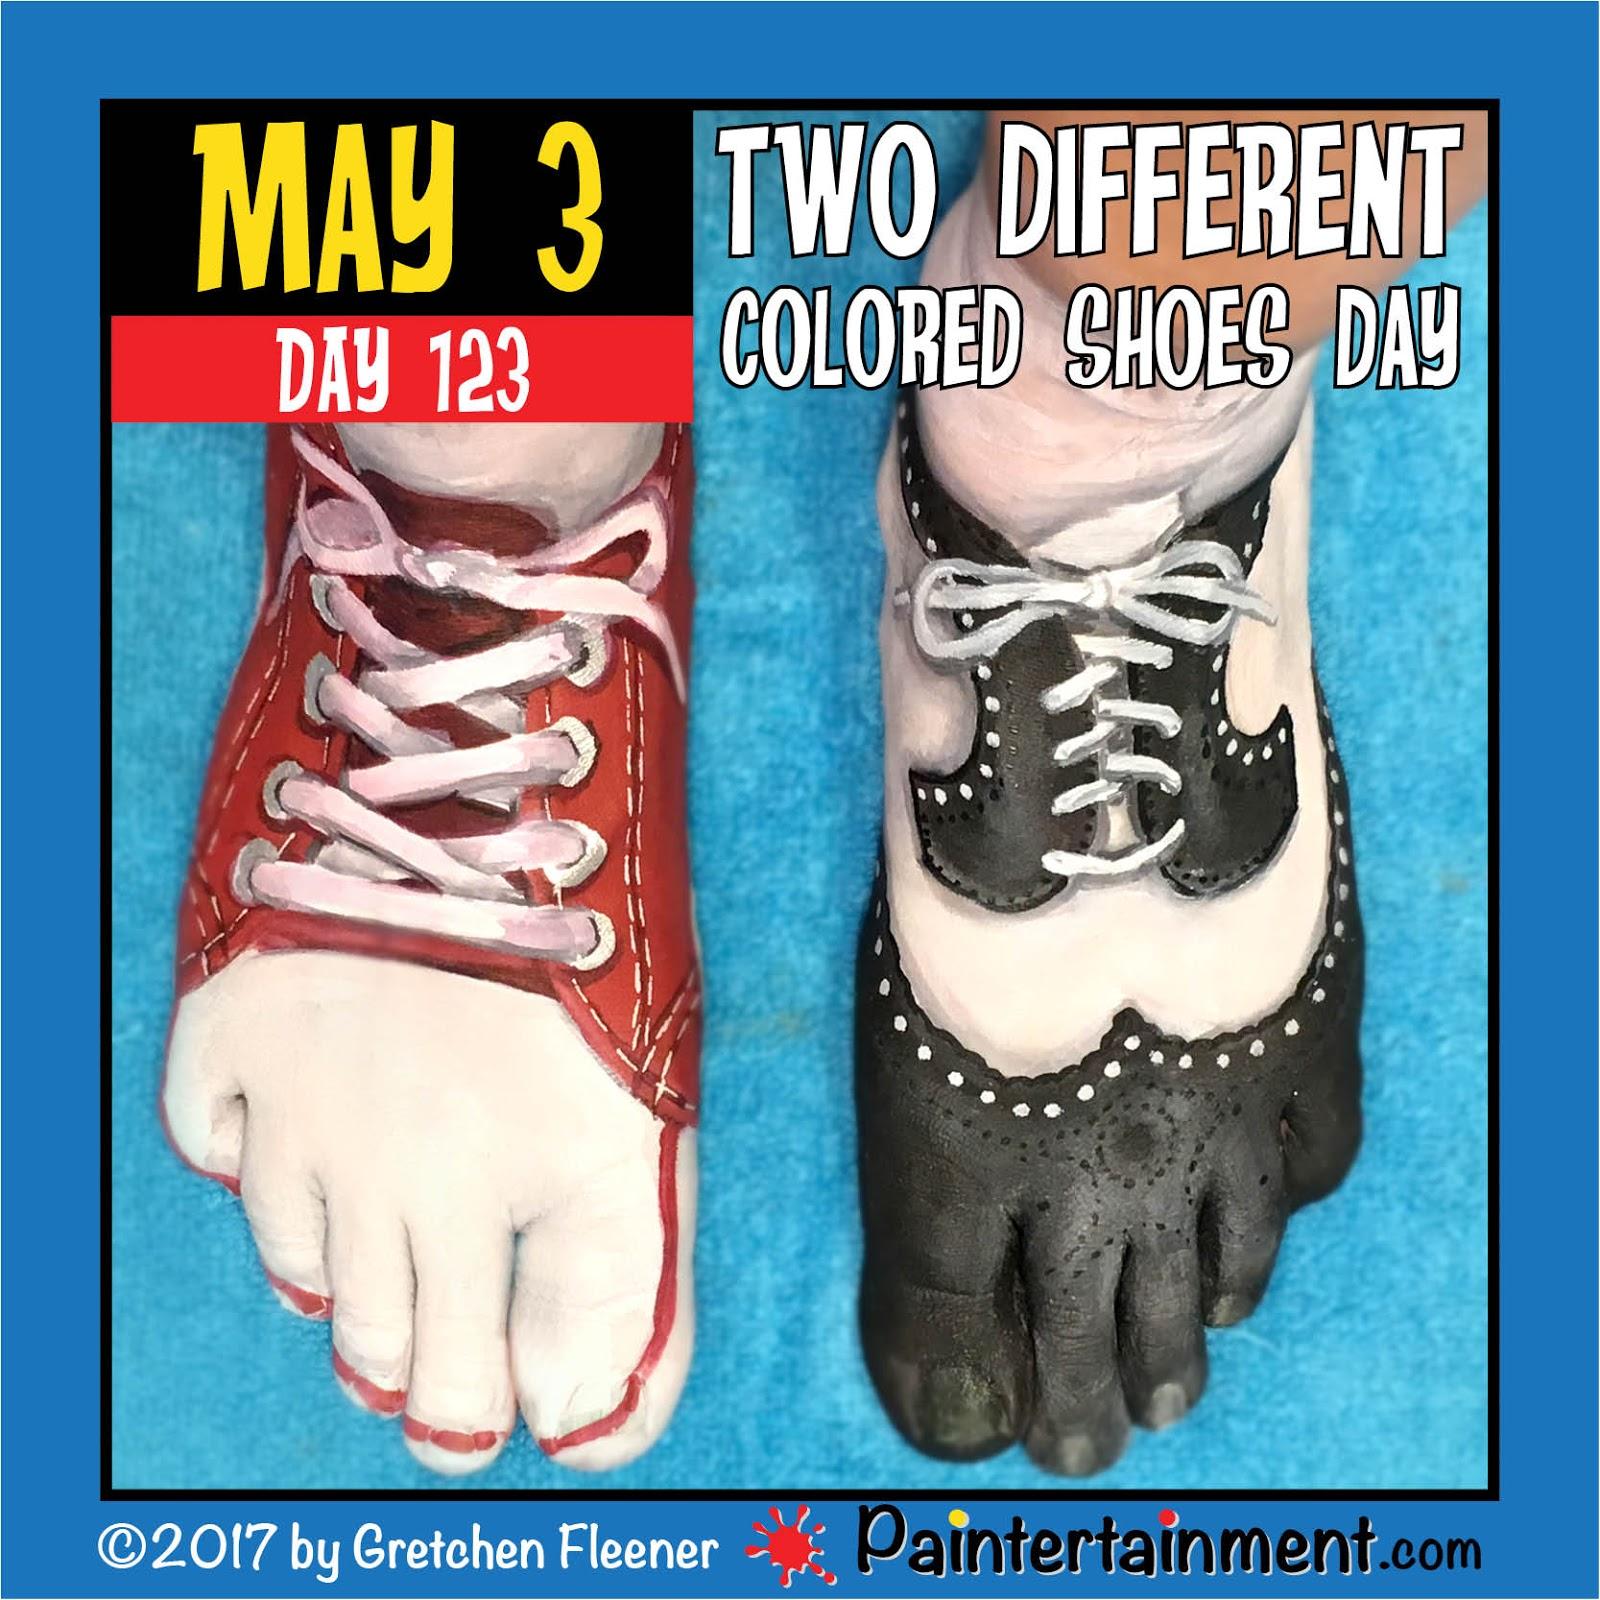 temp-feet-painted-as-shoes.jpg